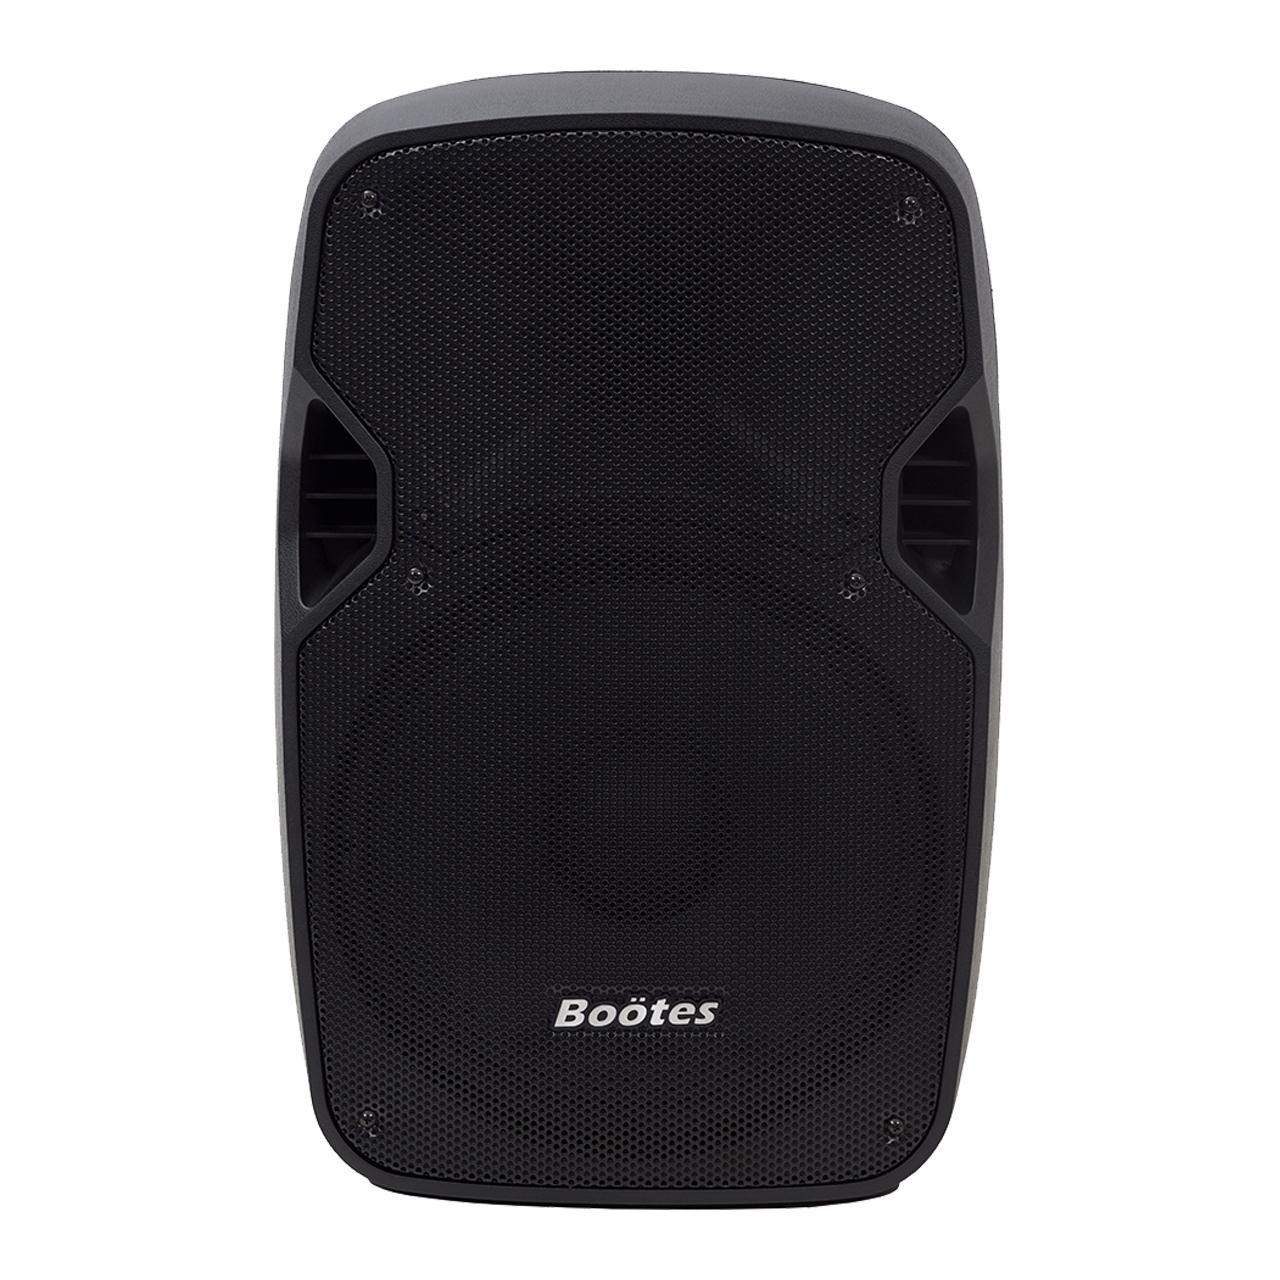 "Caixa Ativa Boötes BDA-1212 (12""/190w RMS/USB/BT/FM/Titânio/Saída para Caixa Passiva)"